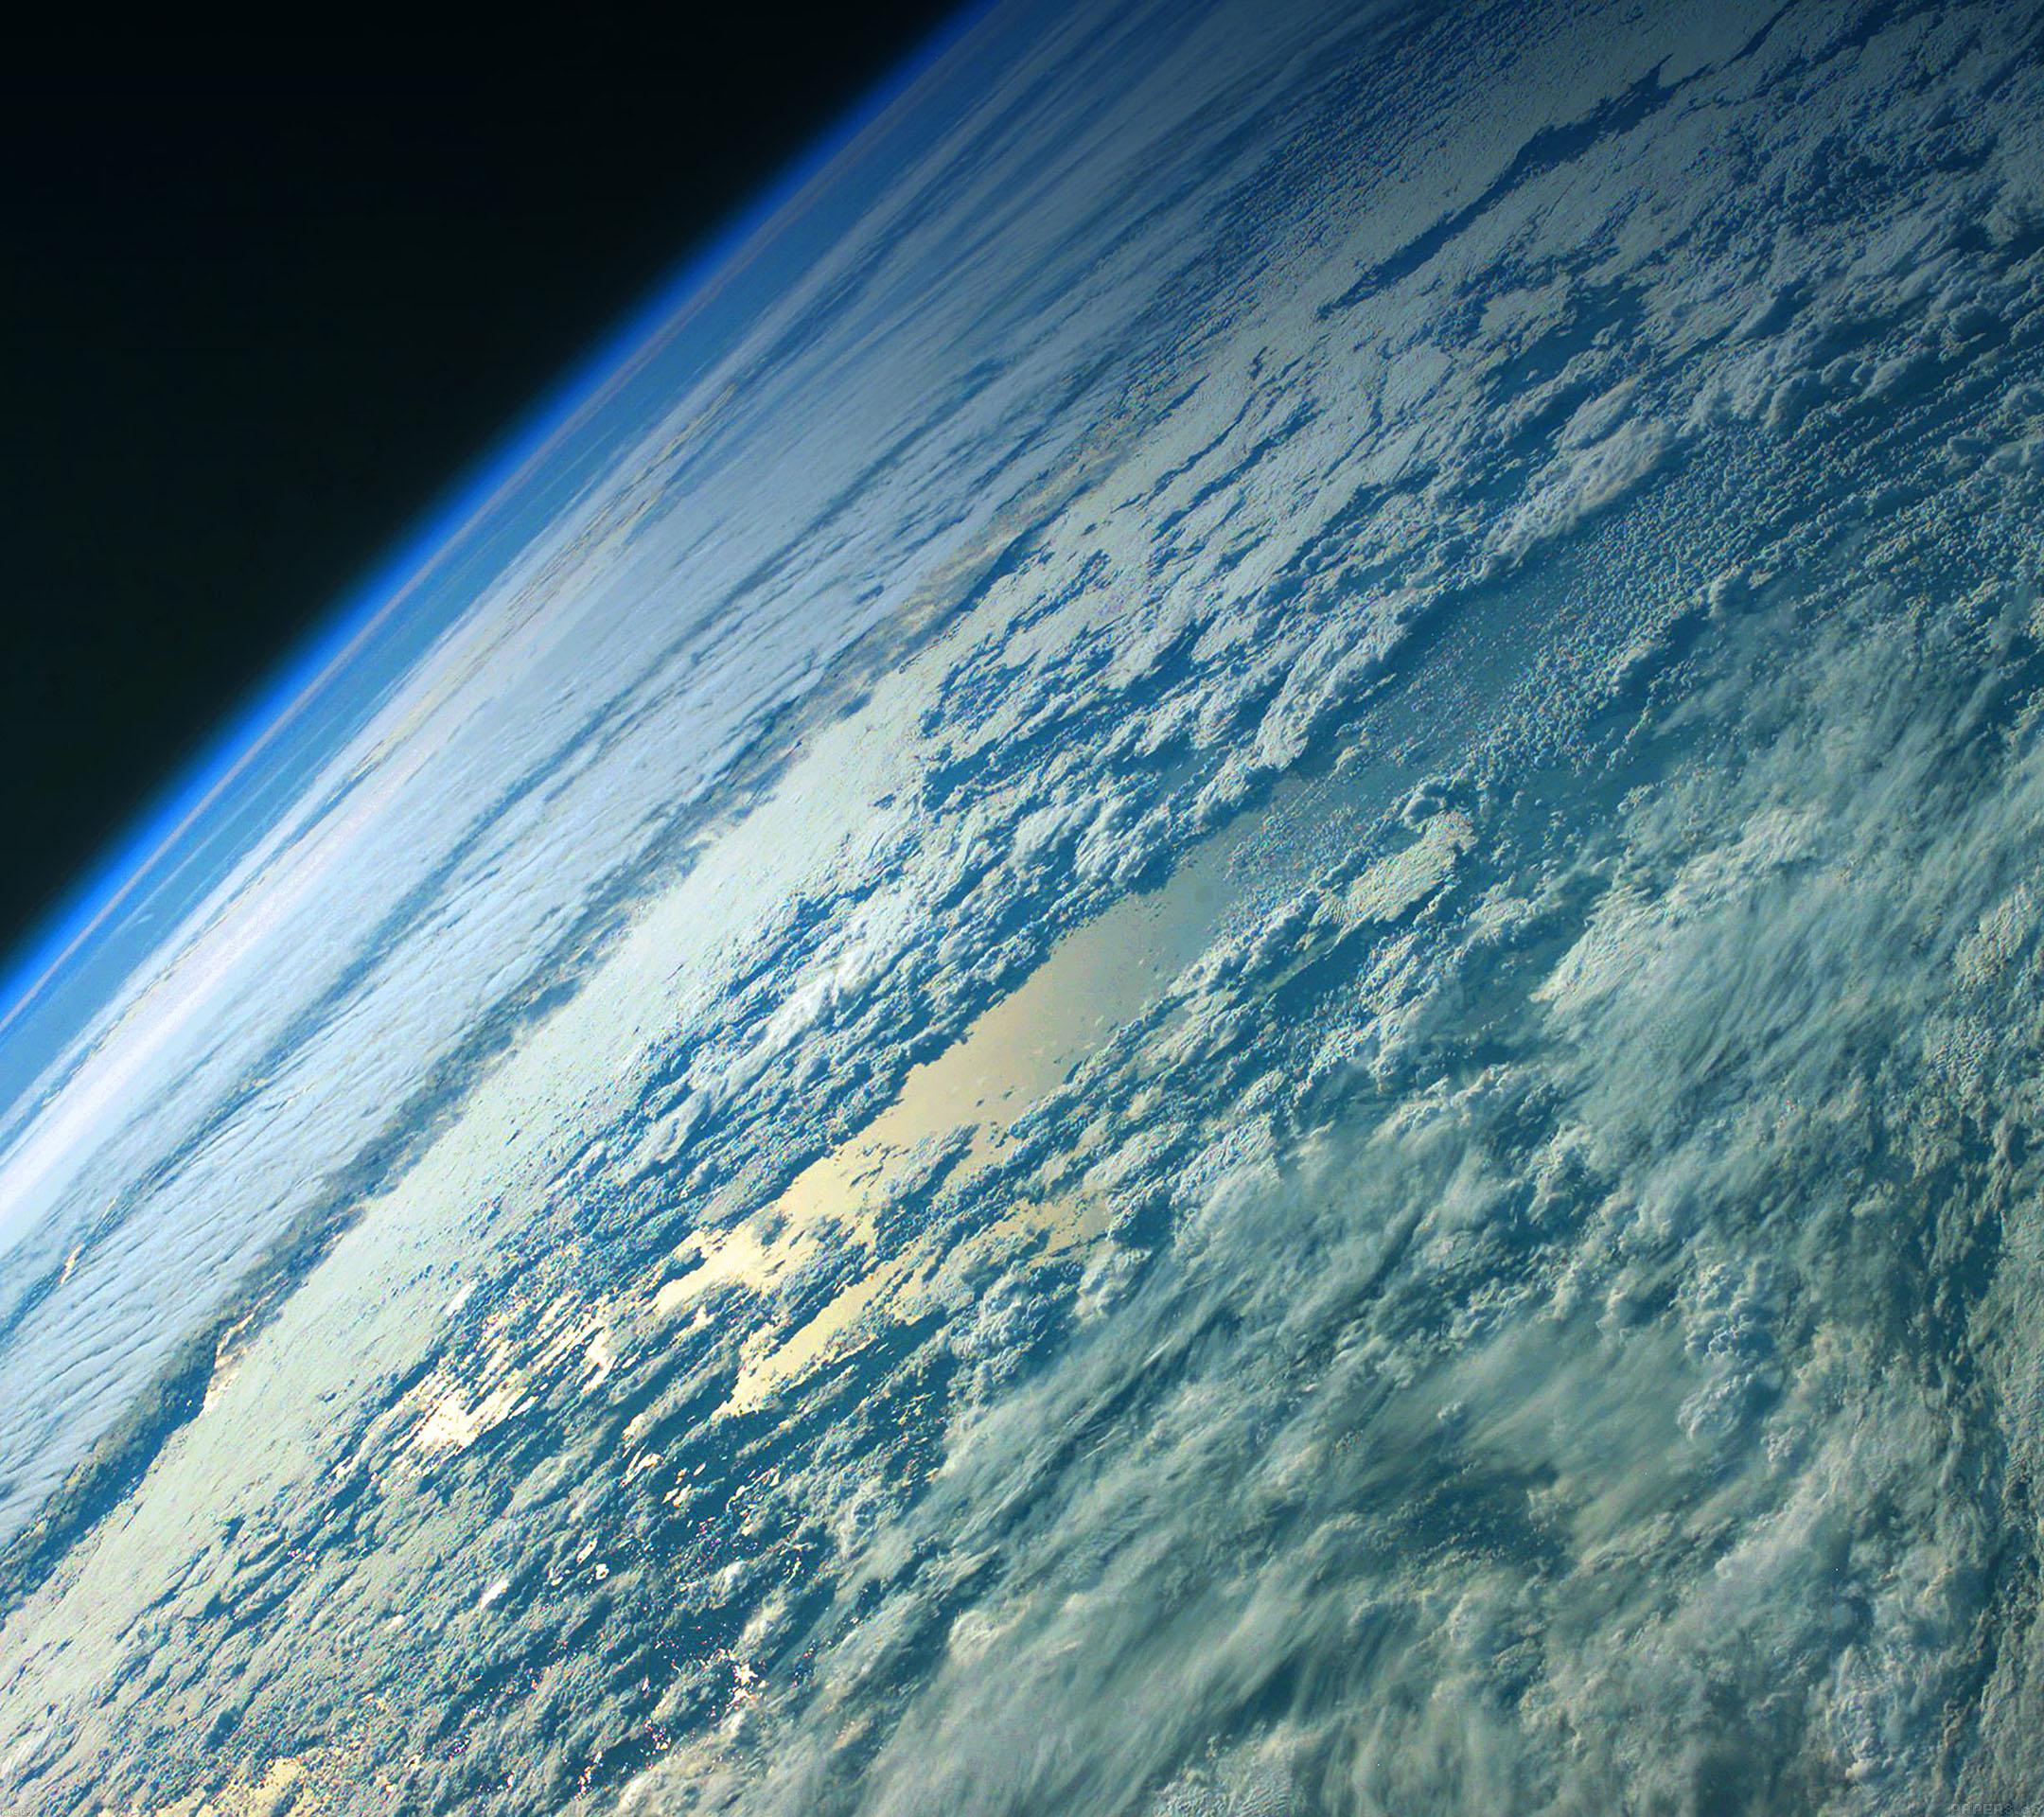 Earth Green Kaleidoscope Paper Pattern Stock Photo - Image: 50351444